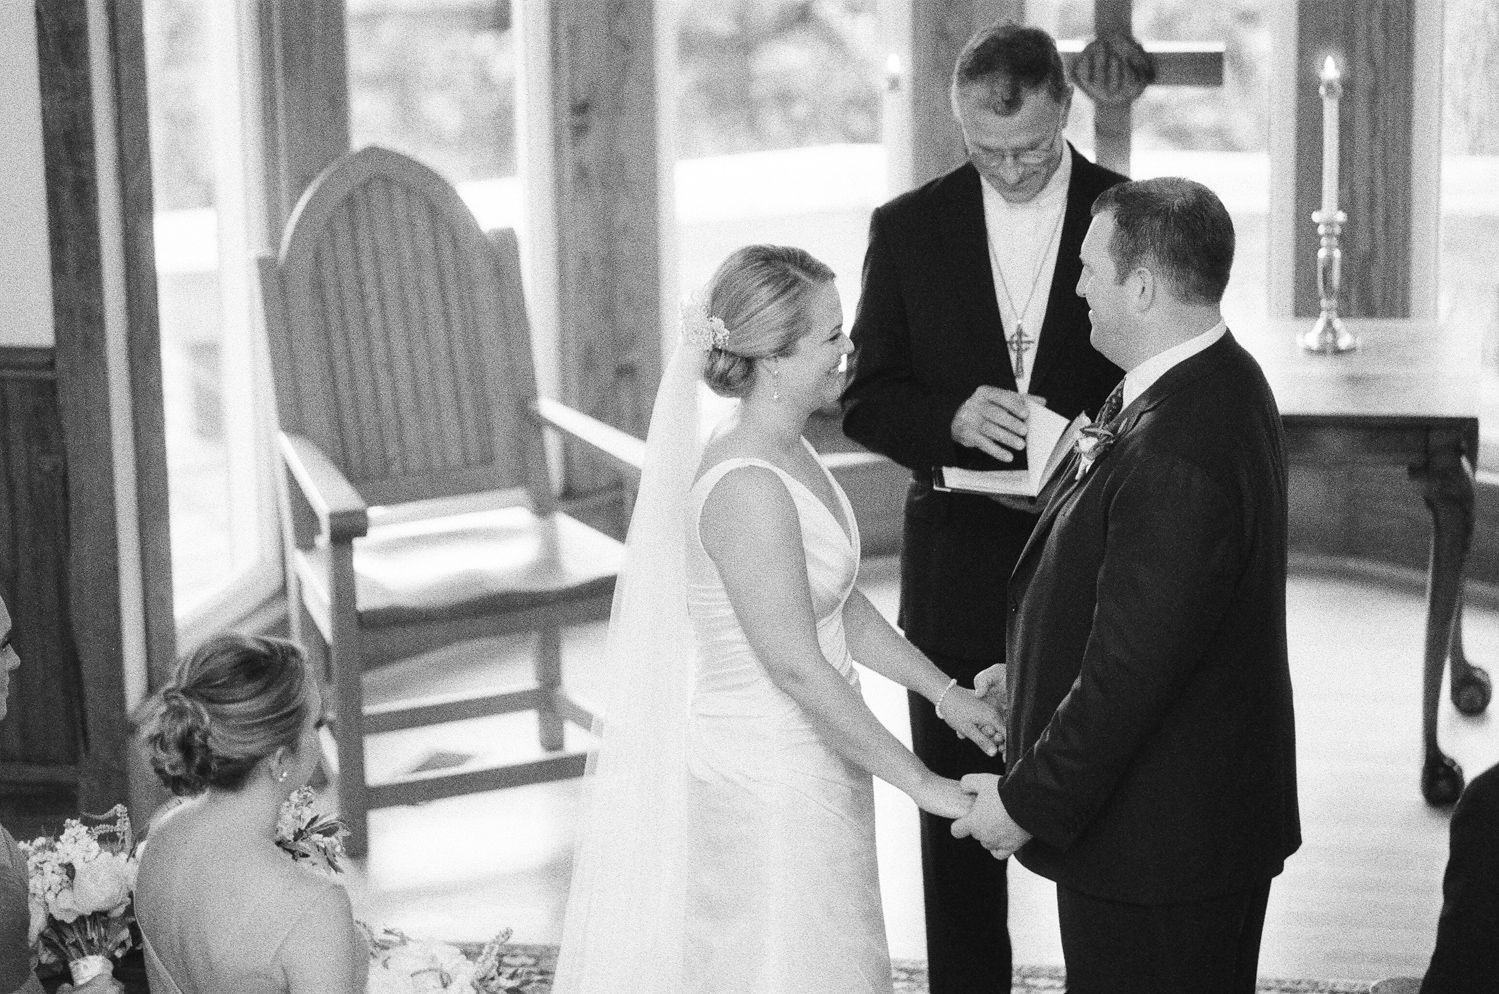 Bald Head Island Wedding Film Photographer 31.jpg